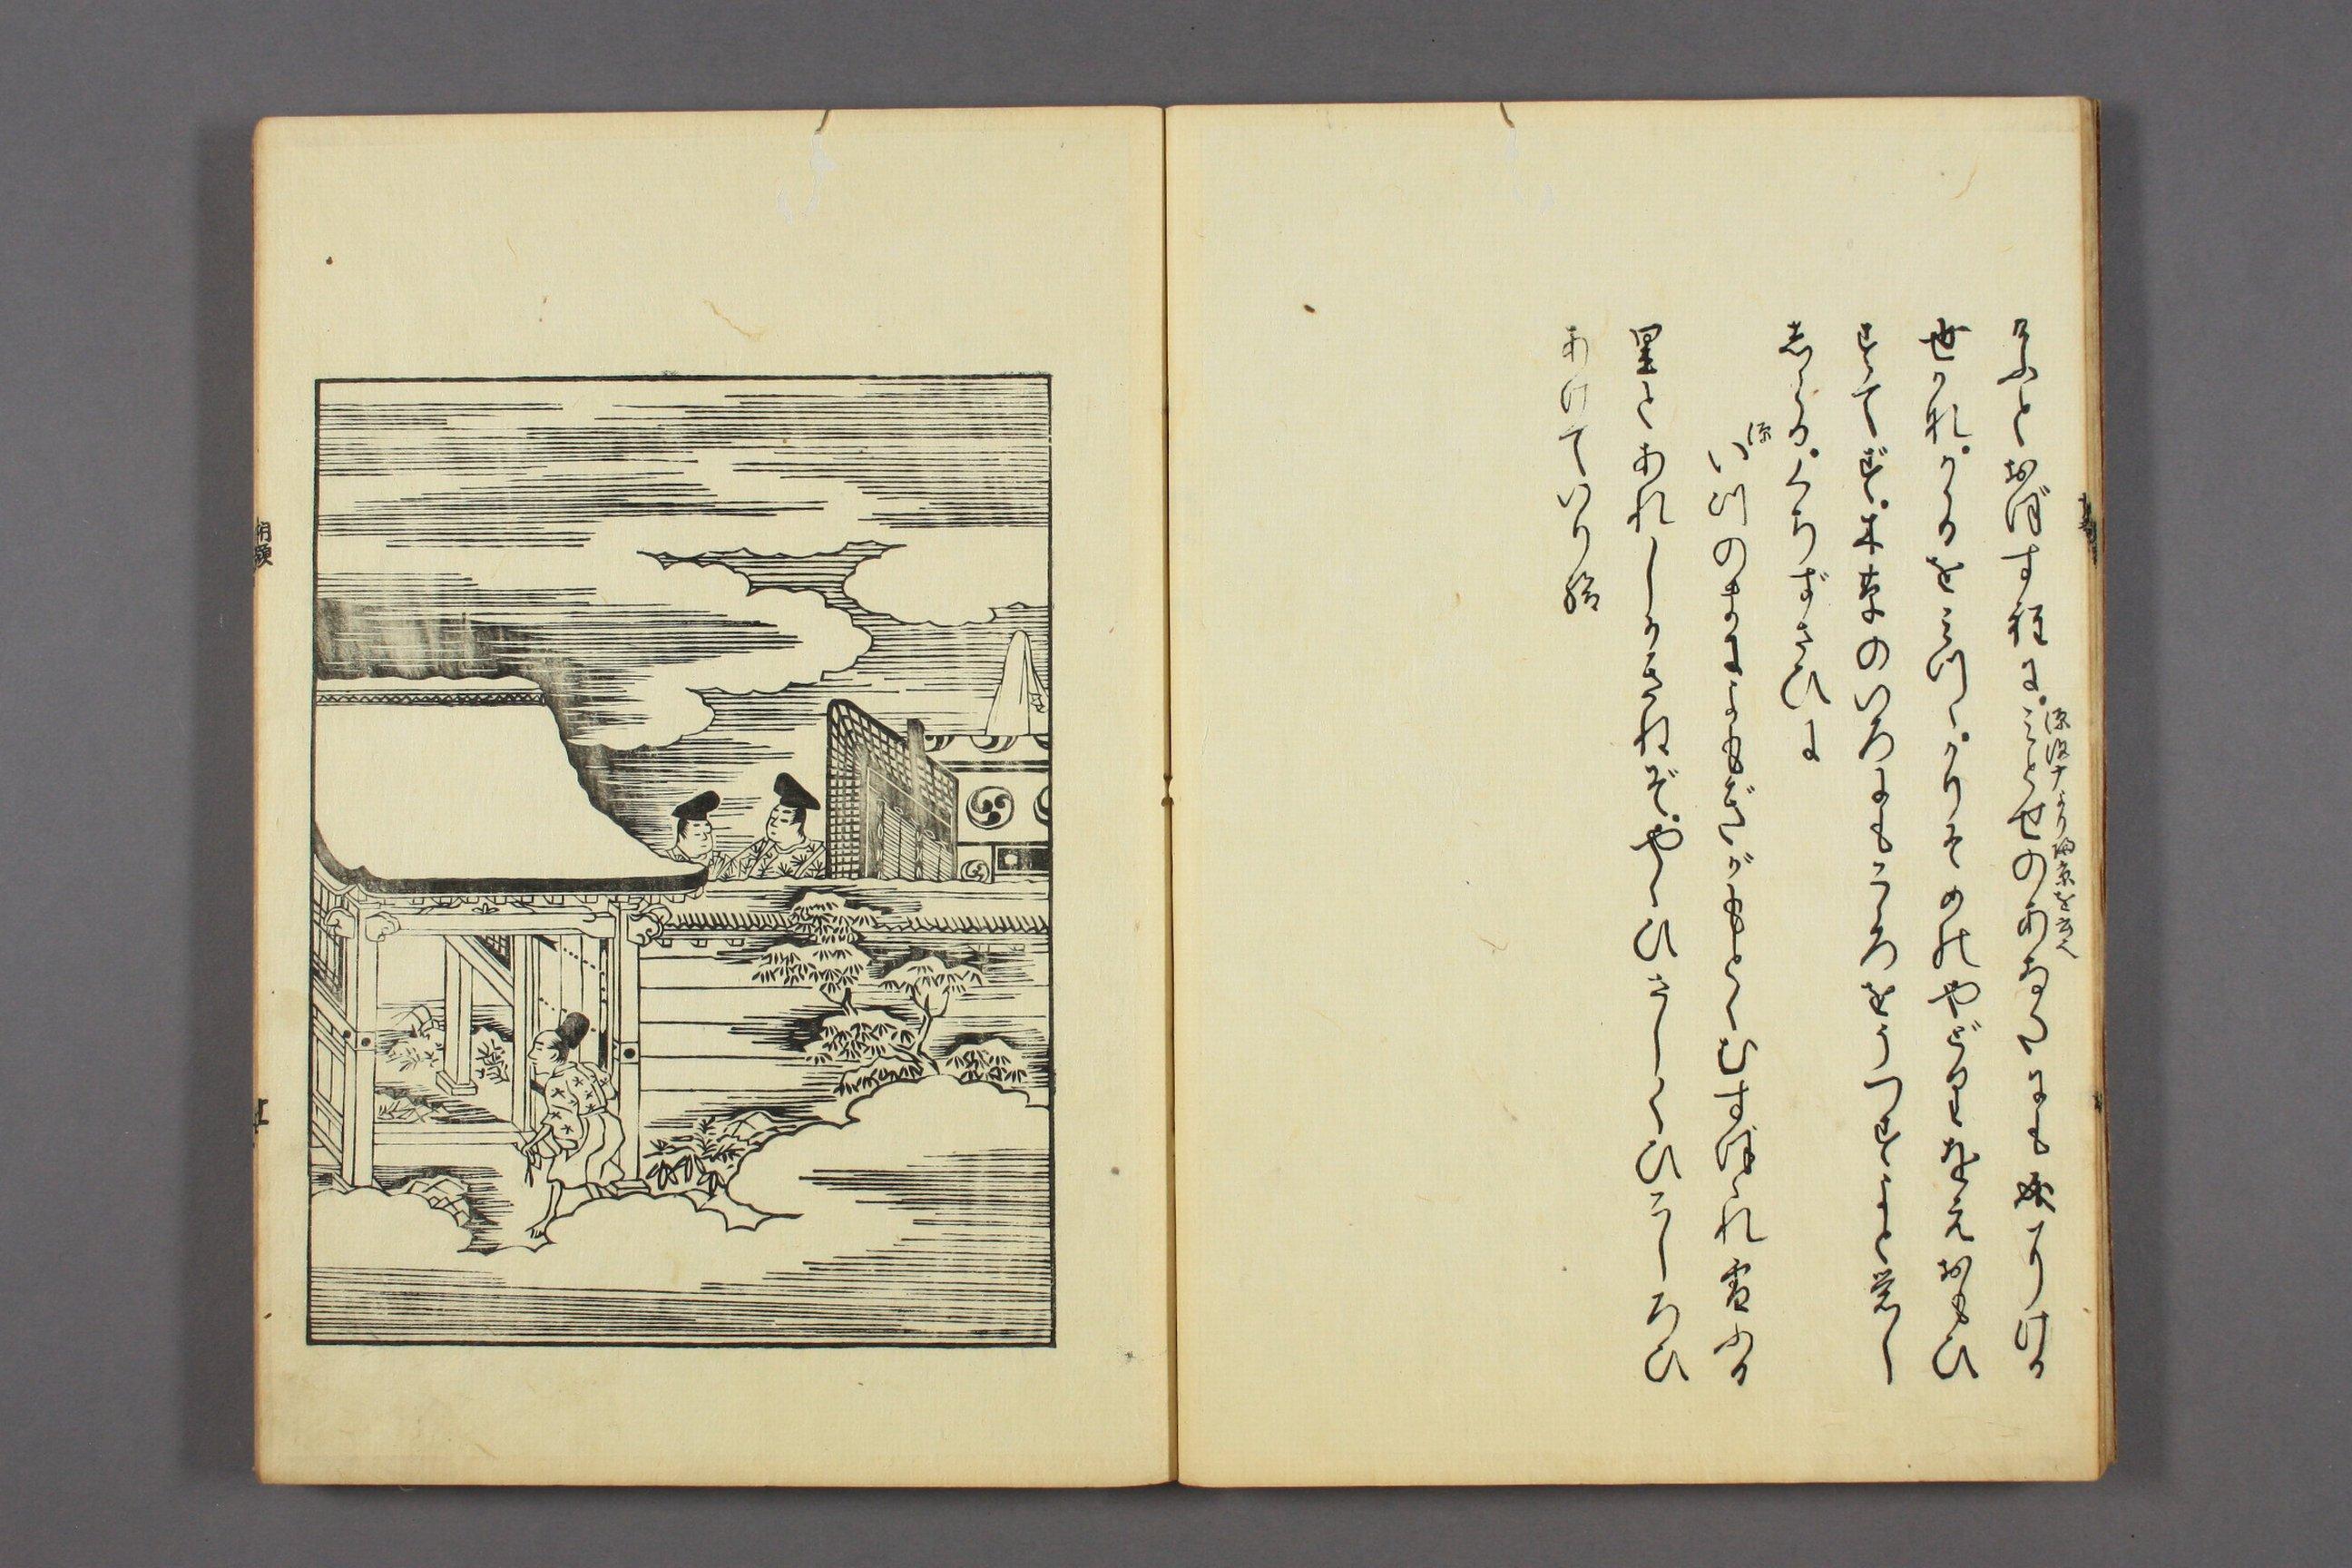 http://archive.wul.waseda.ac.jp/kosho/bunko30/bunko30_a0007/bunko30_a0007_0020/bunko30_a0007_0020_p0012.jpg